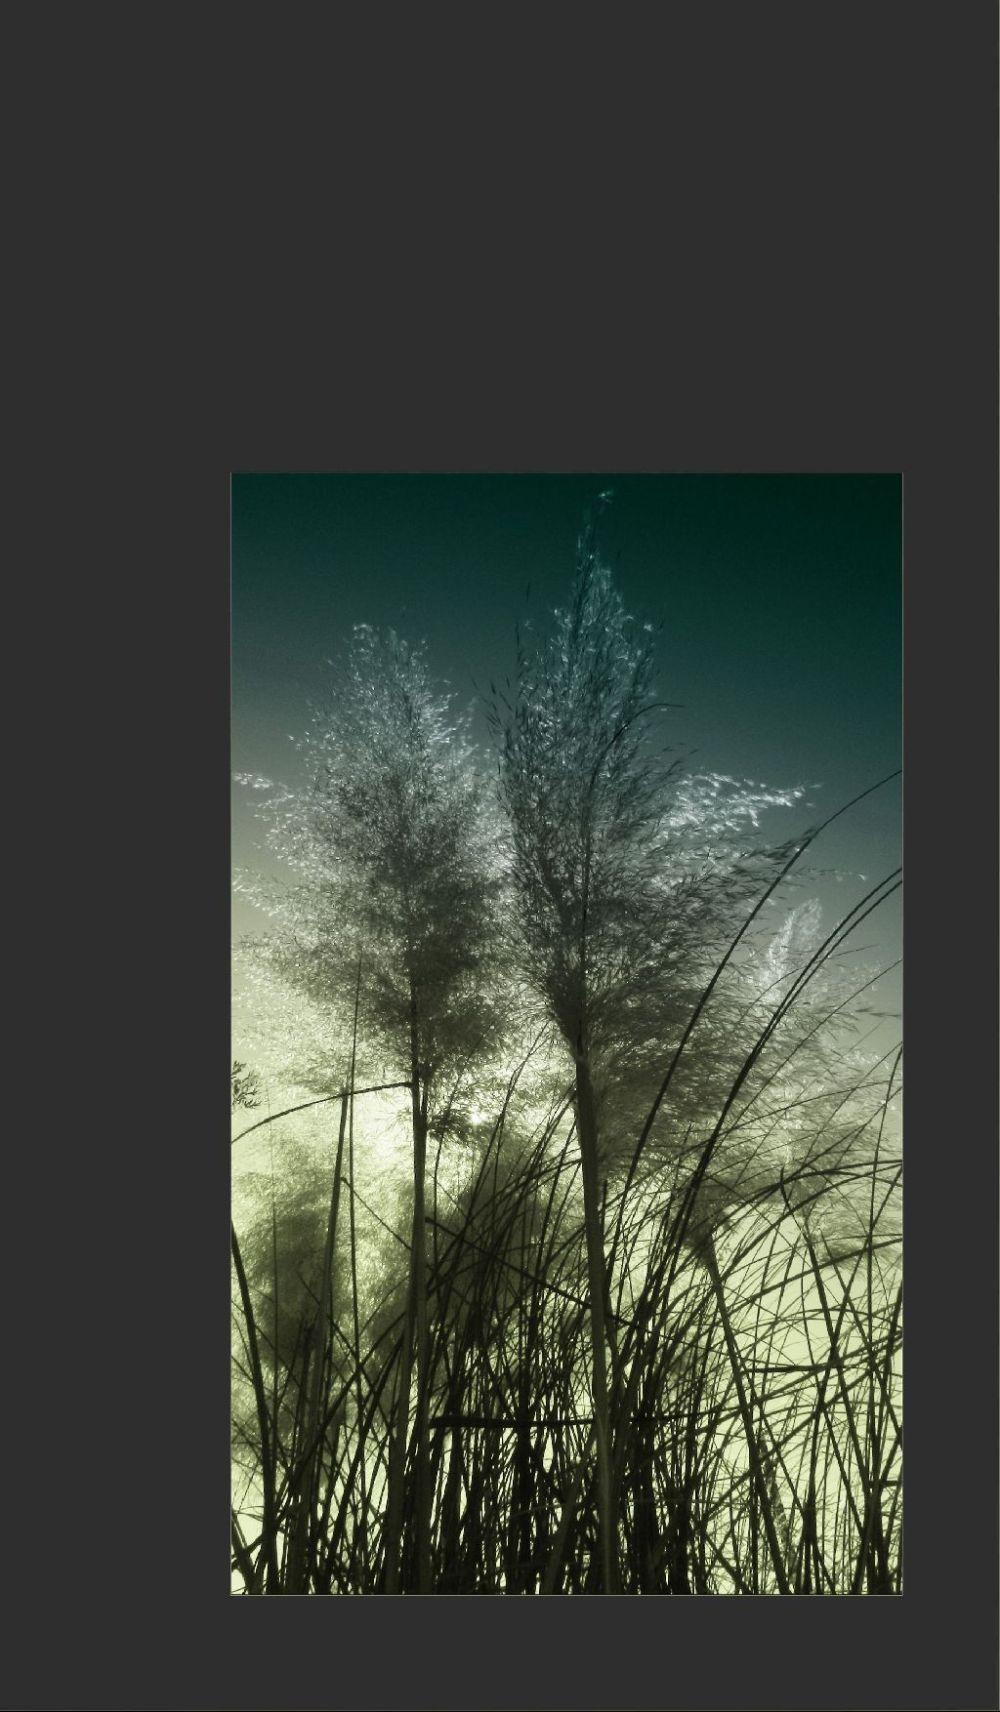 Daybreak of The Japanese Pampas Grass Field